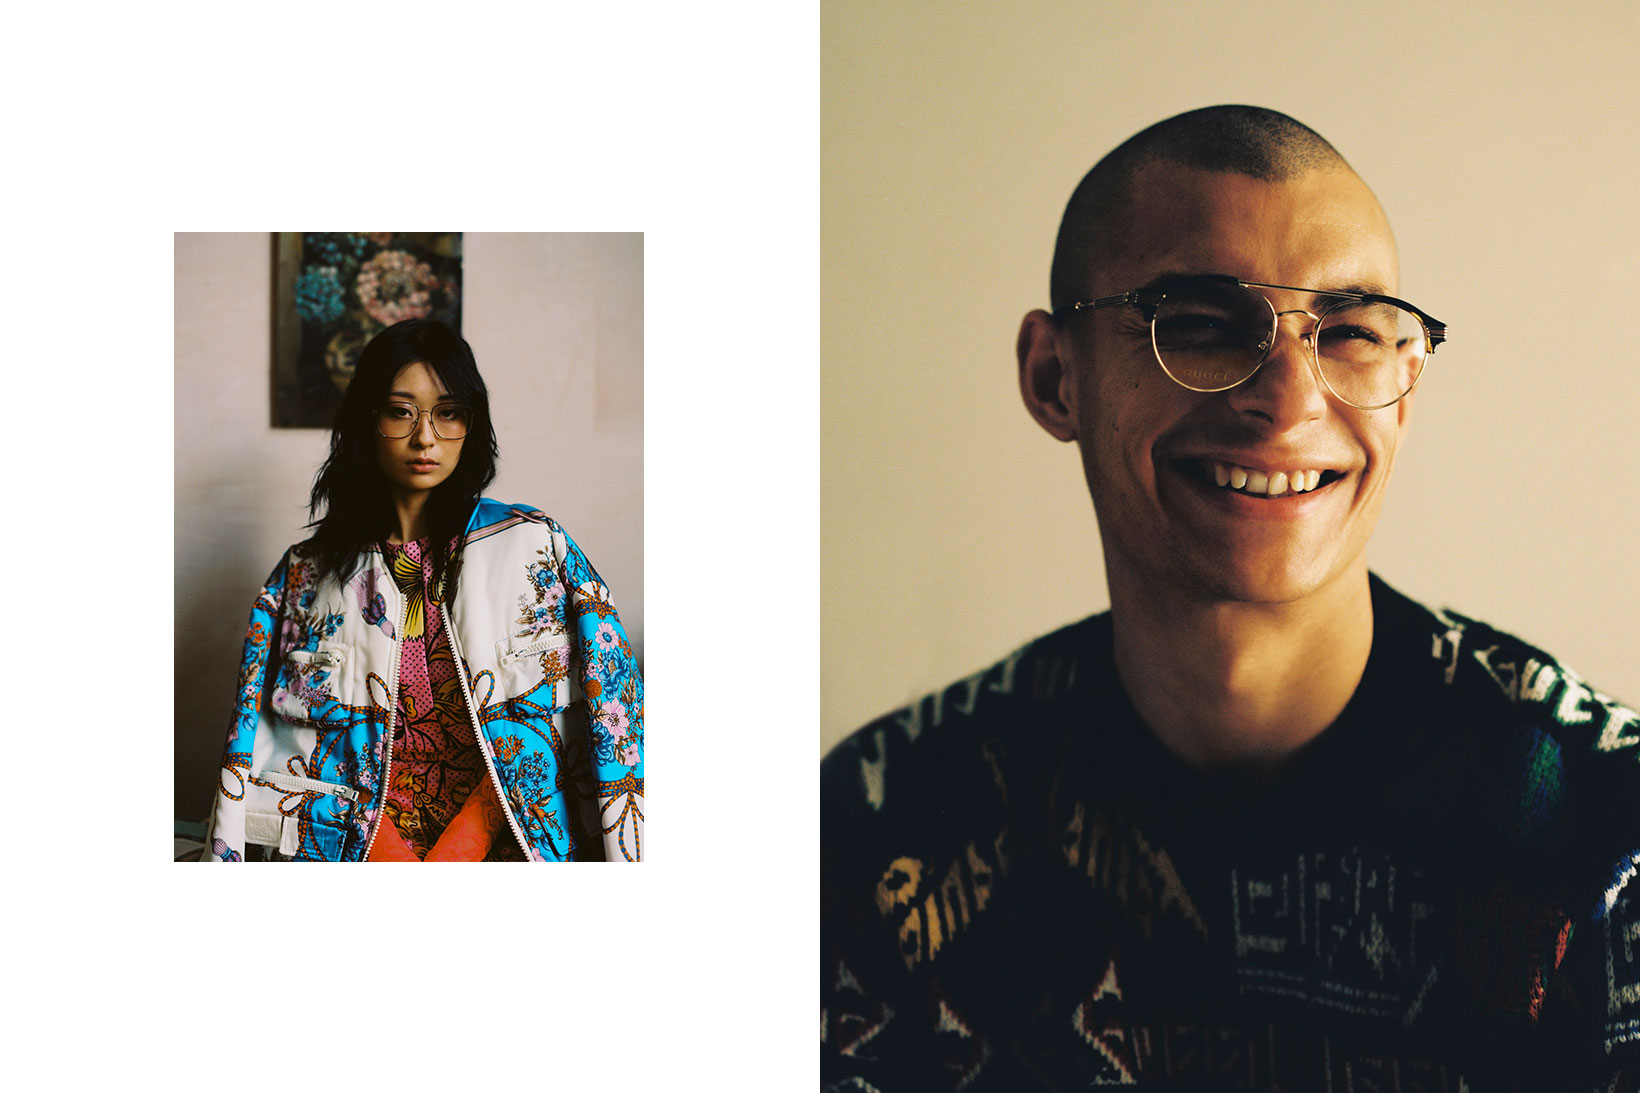 Gucci-eyewear-collection-fall-winter-2018-4.jpg